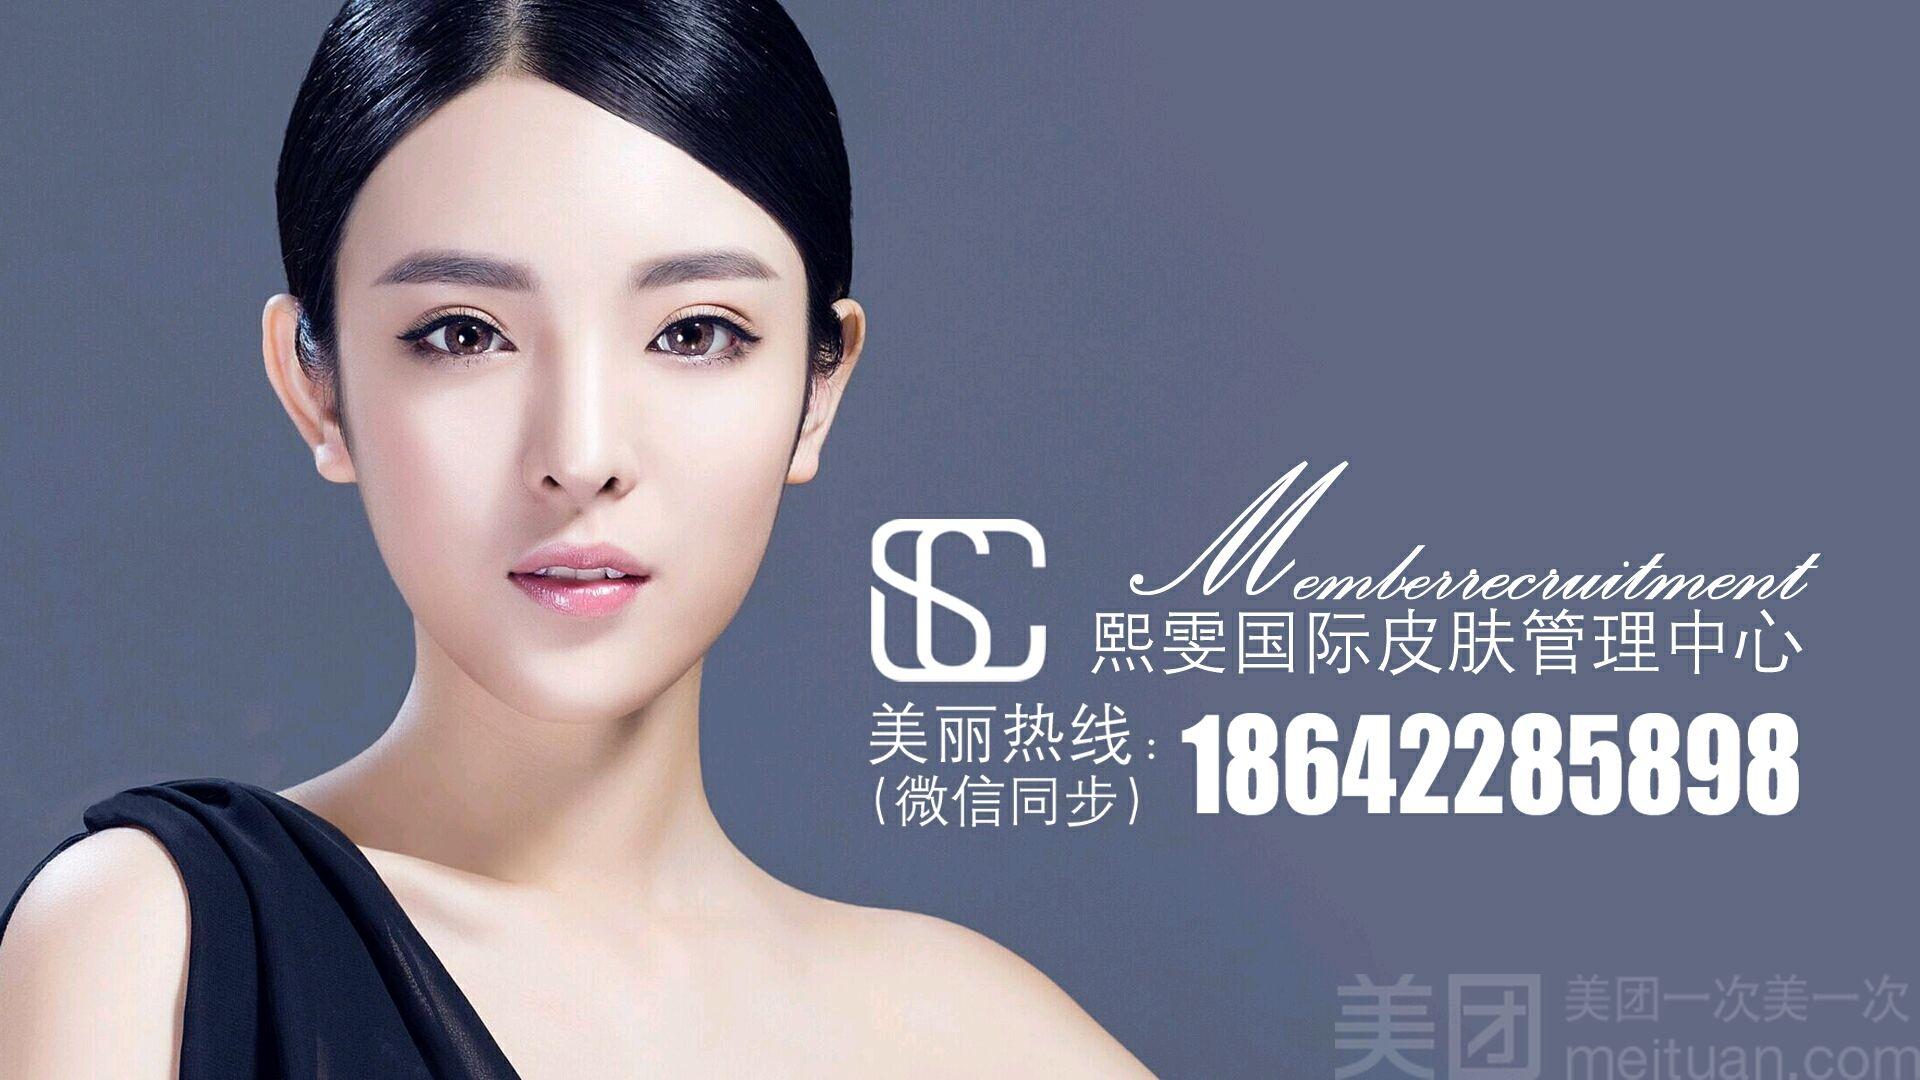 sc熙雯国际皮肤管理中心-美团